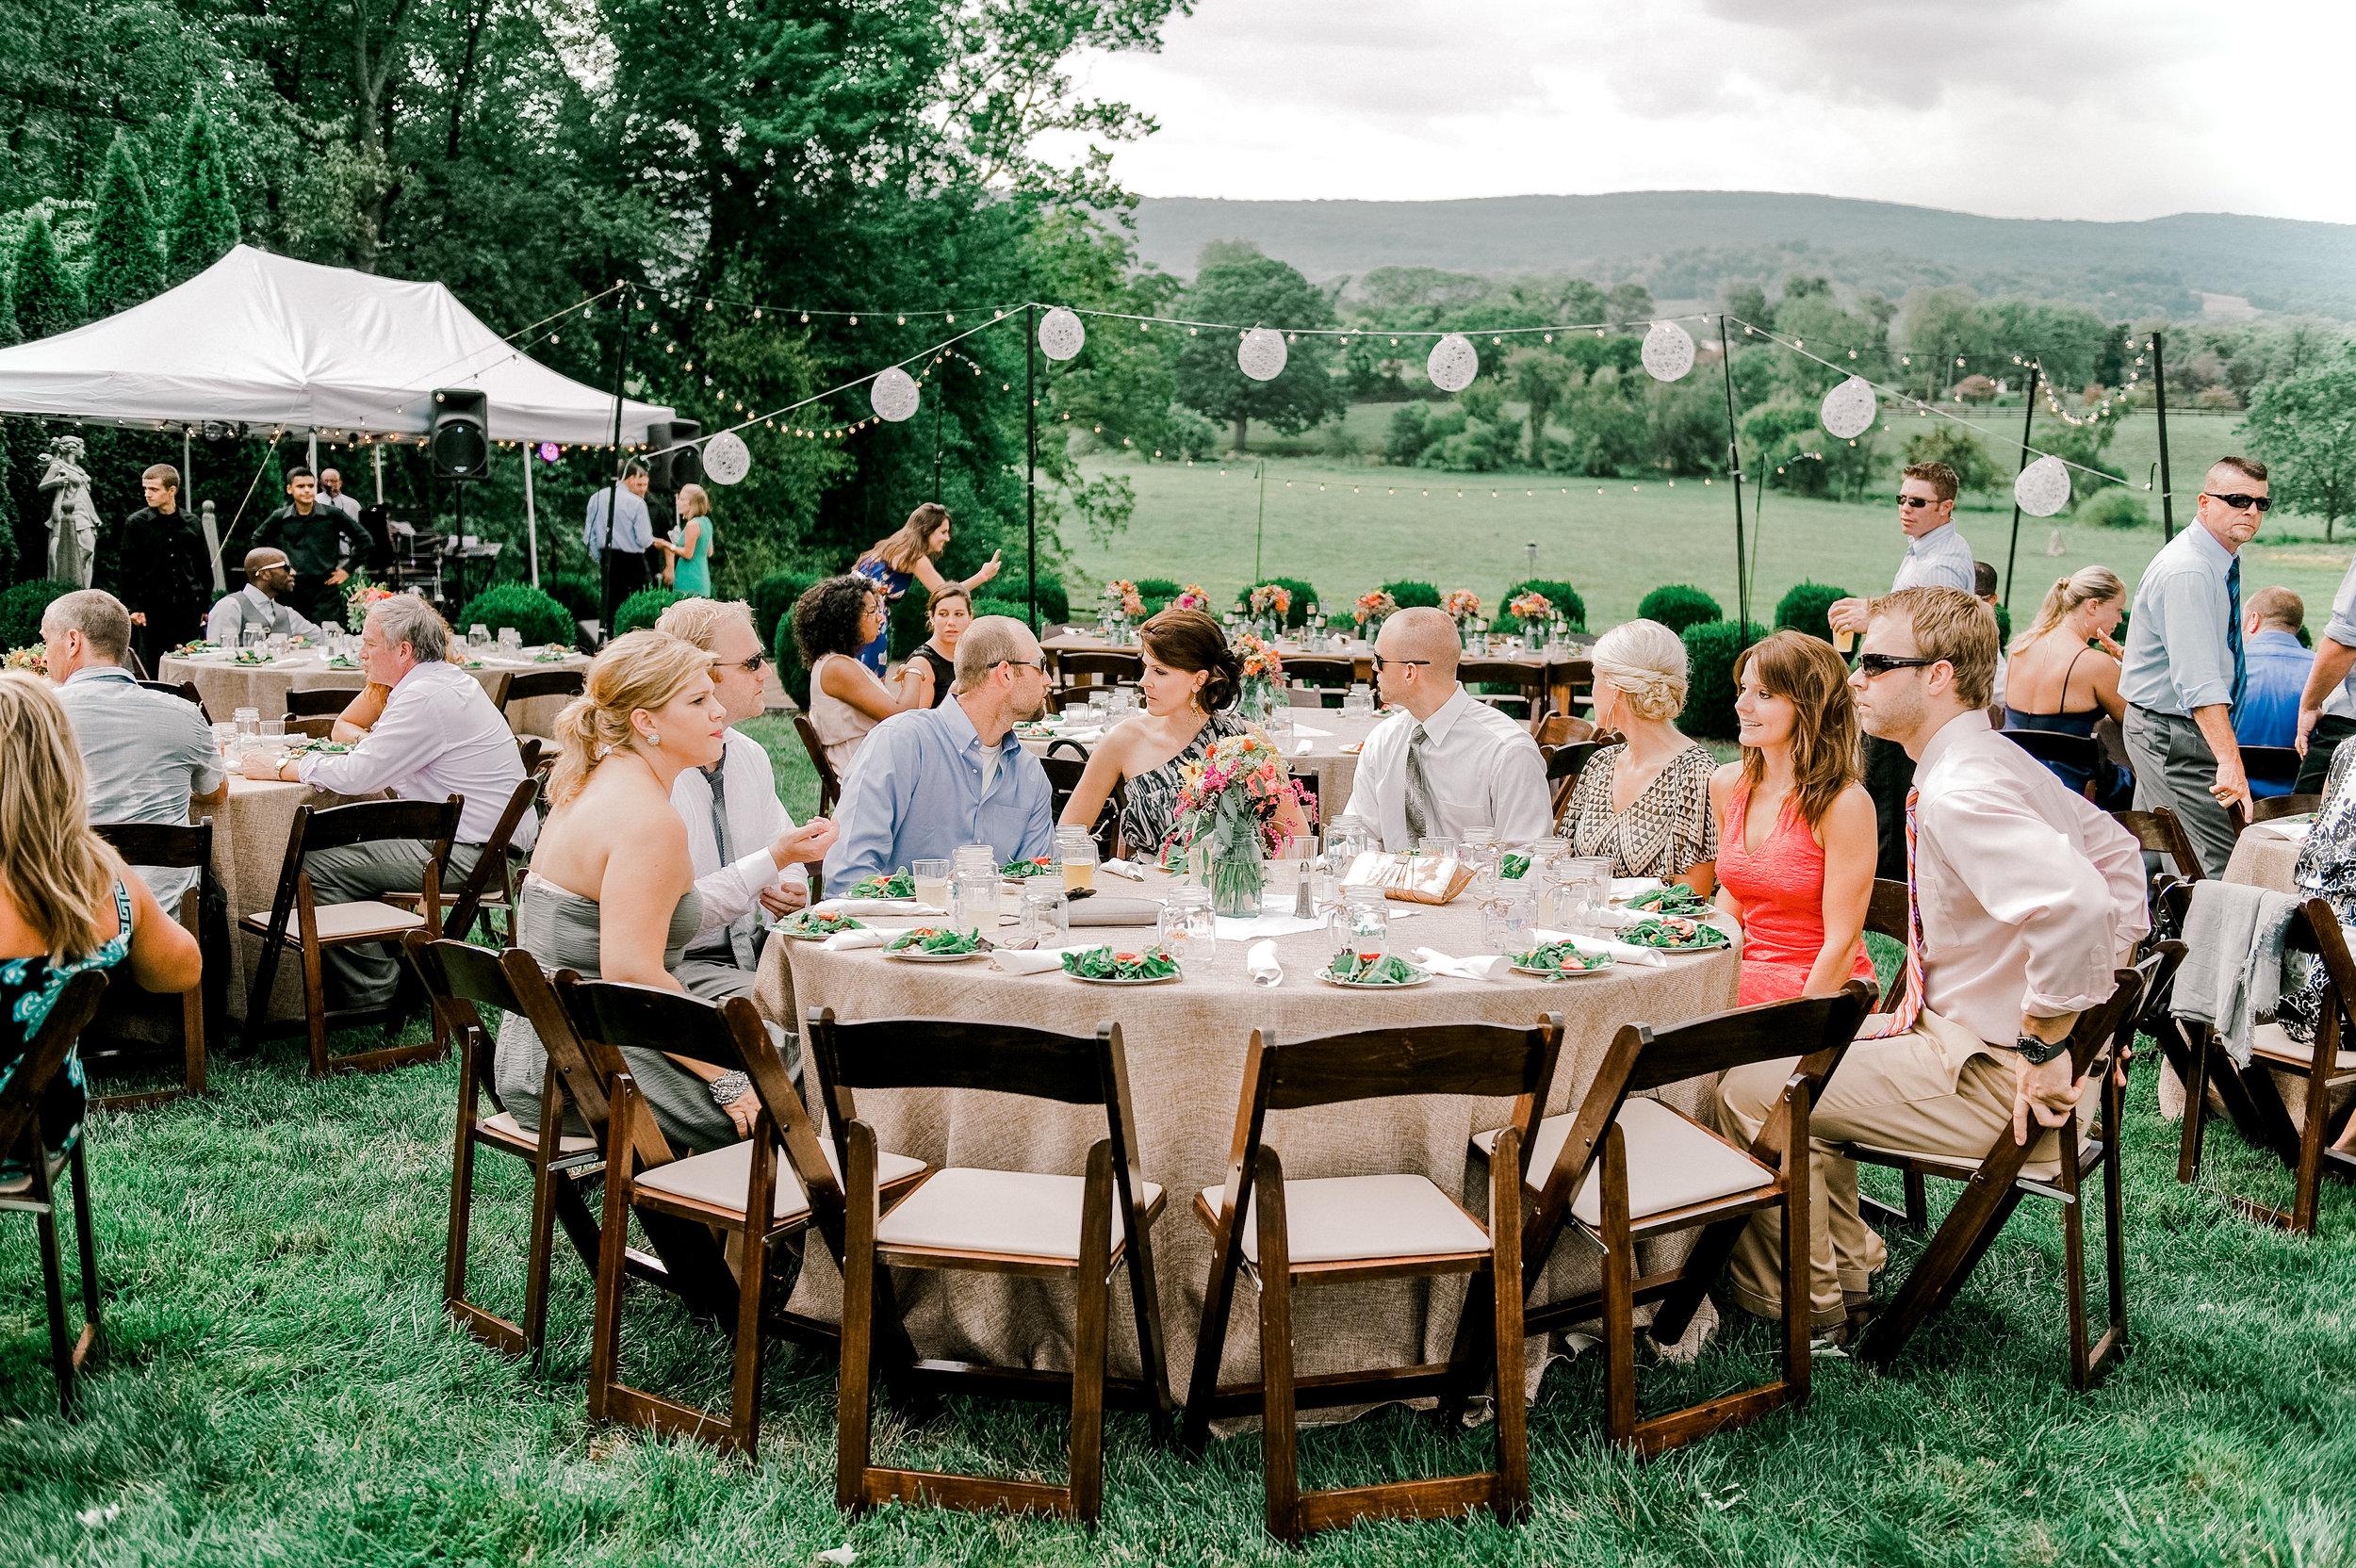 Silverbrook-Farm-Weddings-Virginia-36.jpg